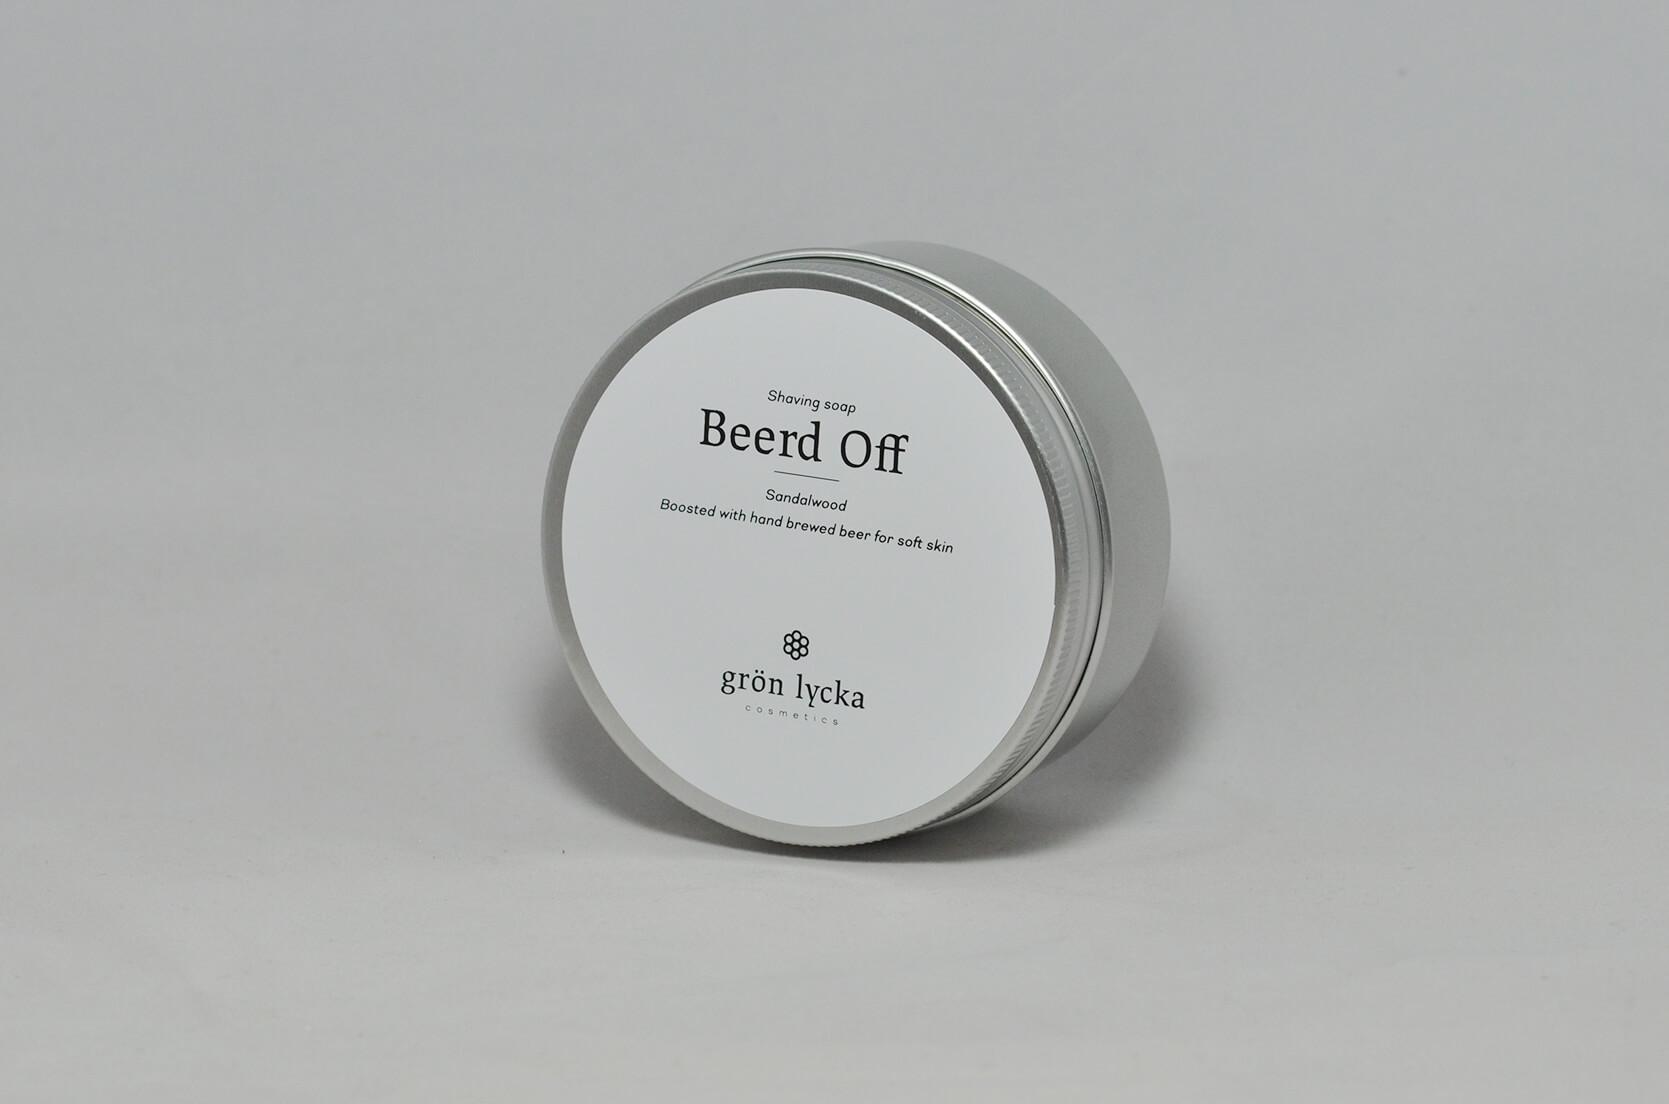 Grön Lycka - Beerd Off - Soap image